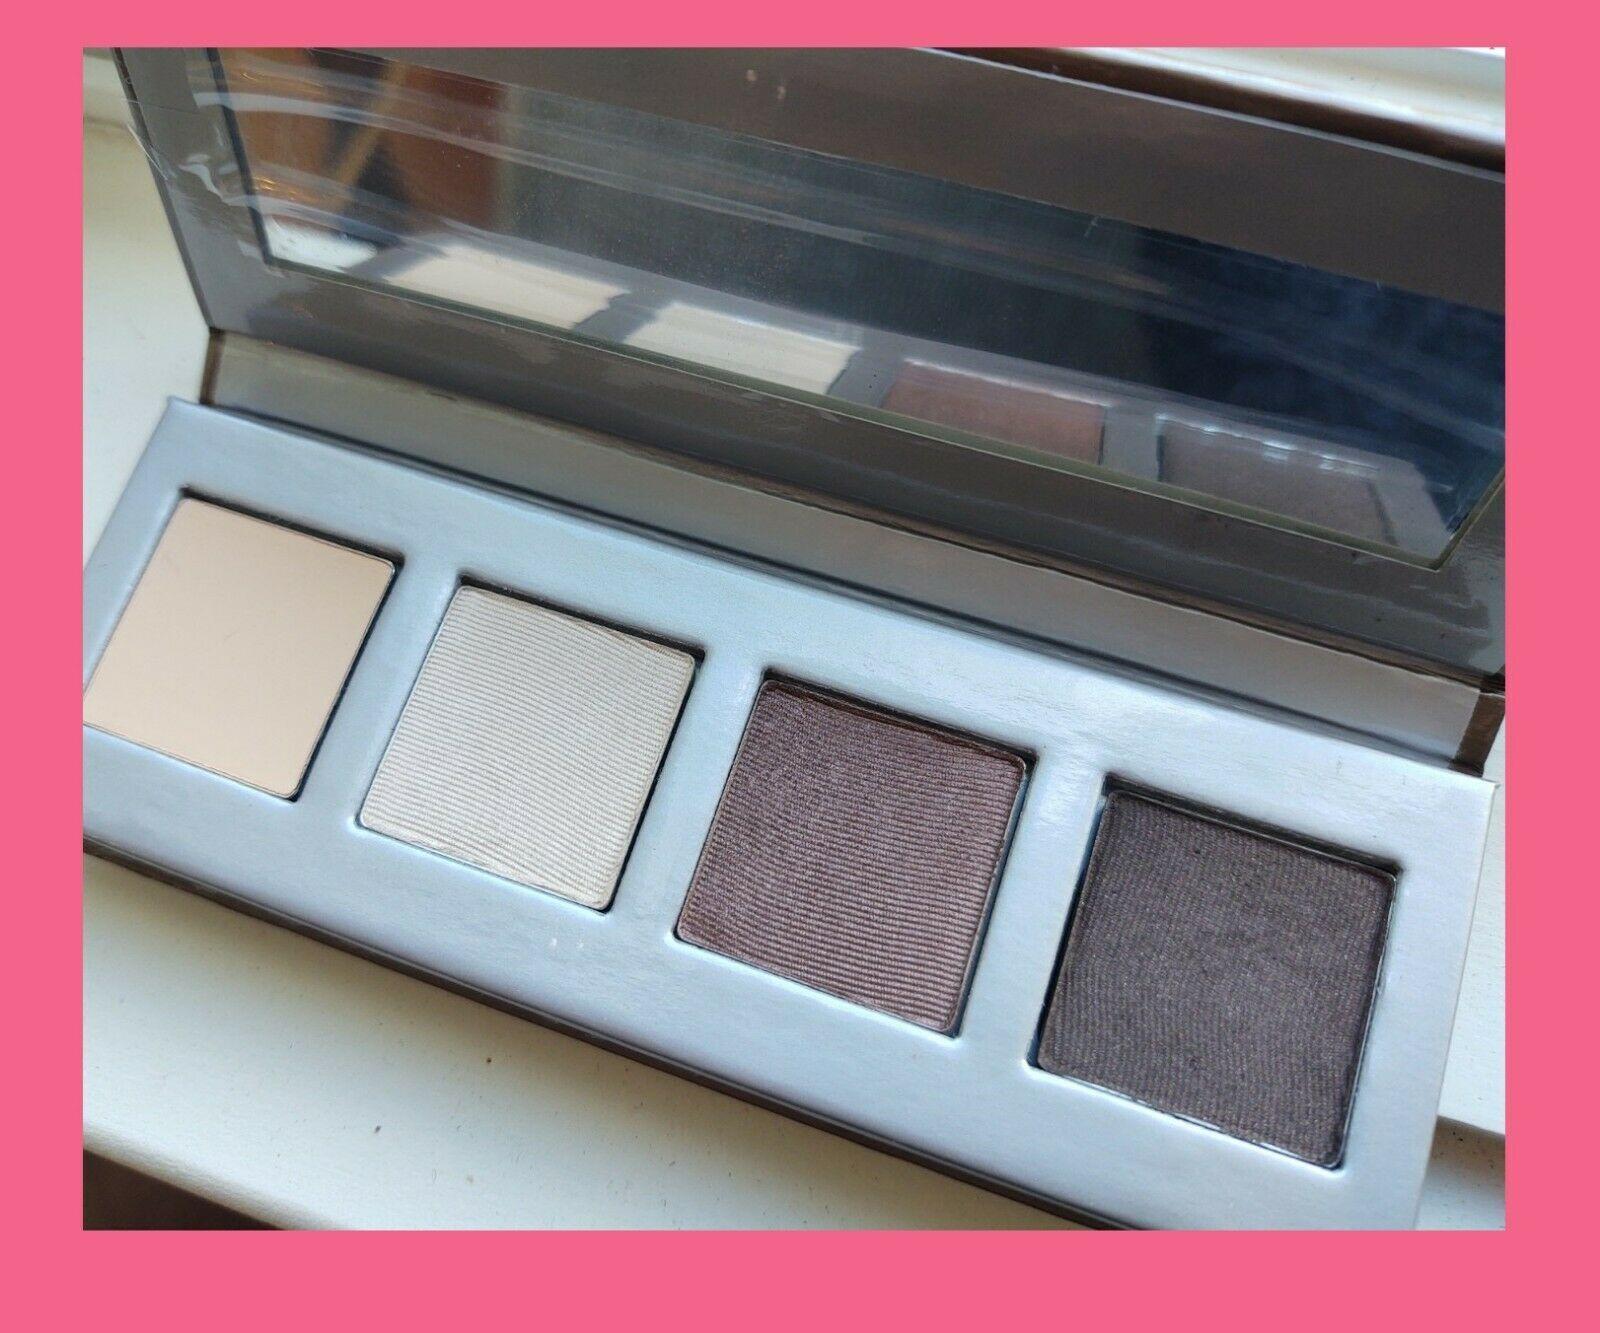 Mally Eyeshadow Palette Shadow Base Primer, Whipped Cream, Macchiato & Espresso - $10.81